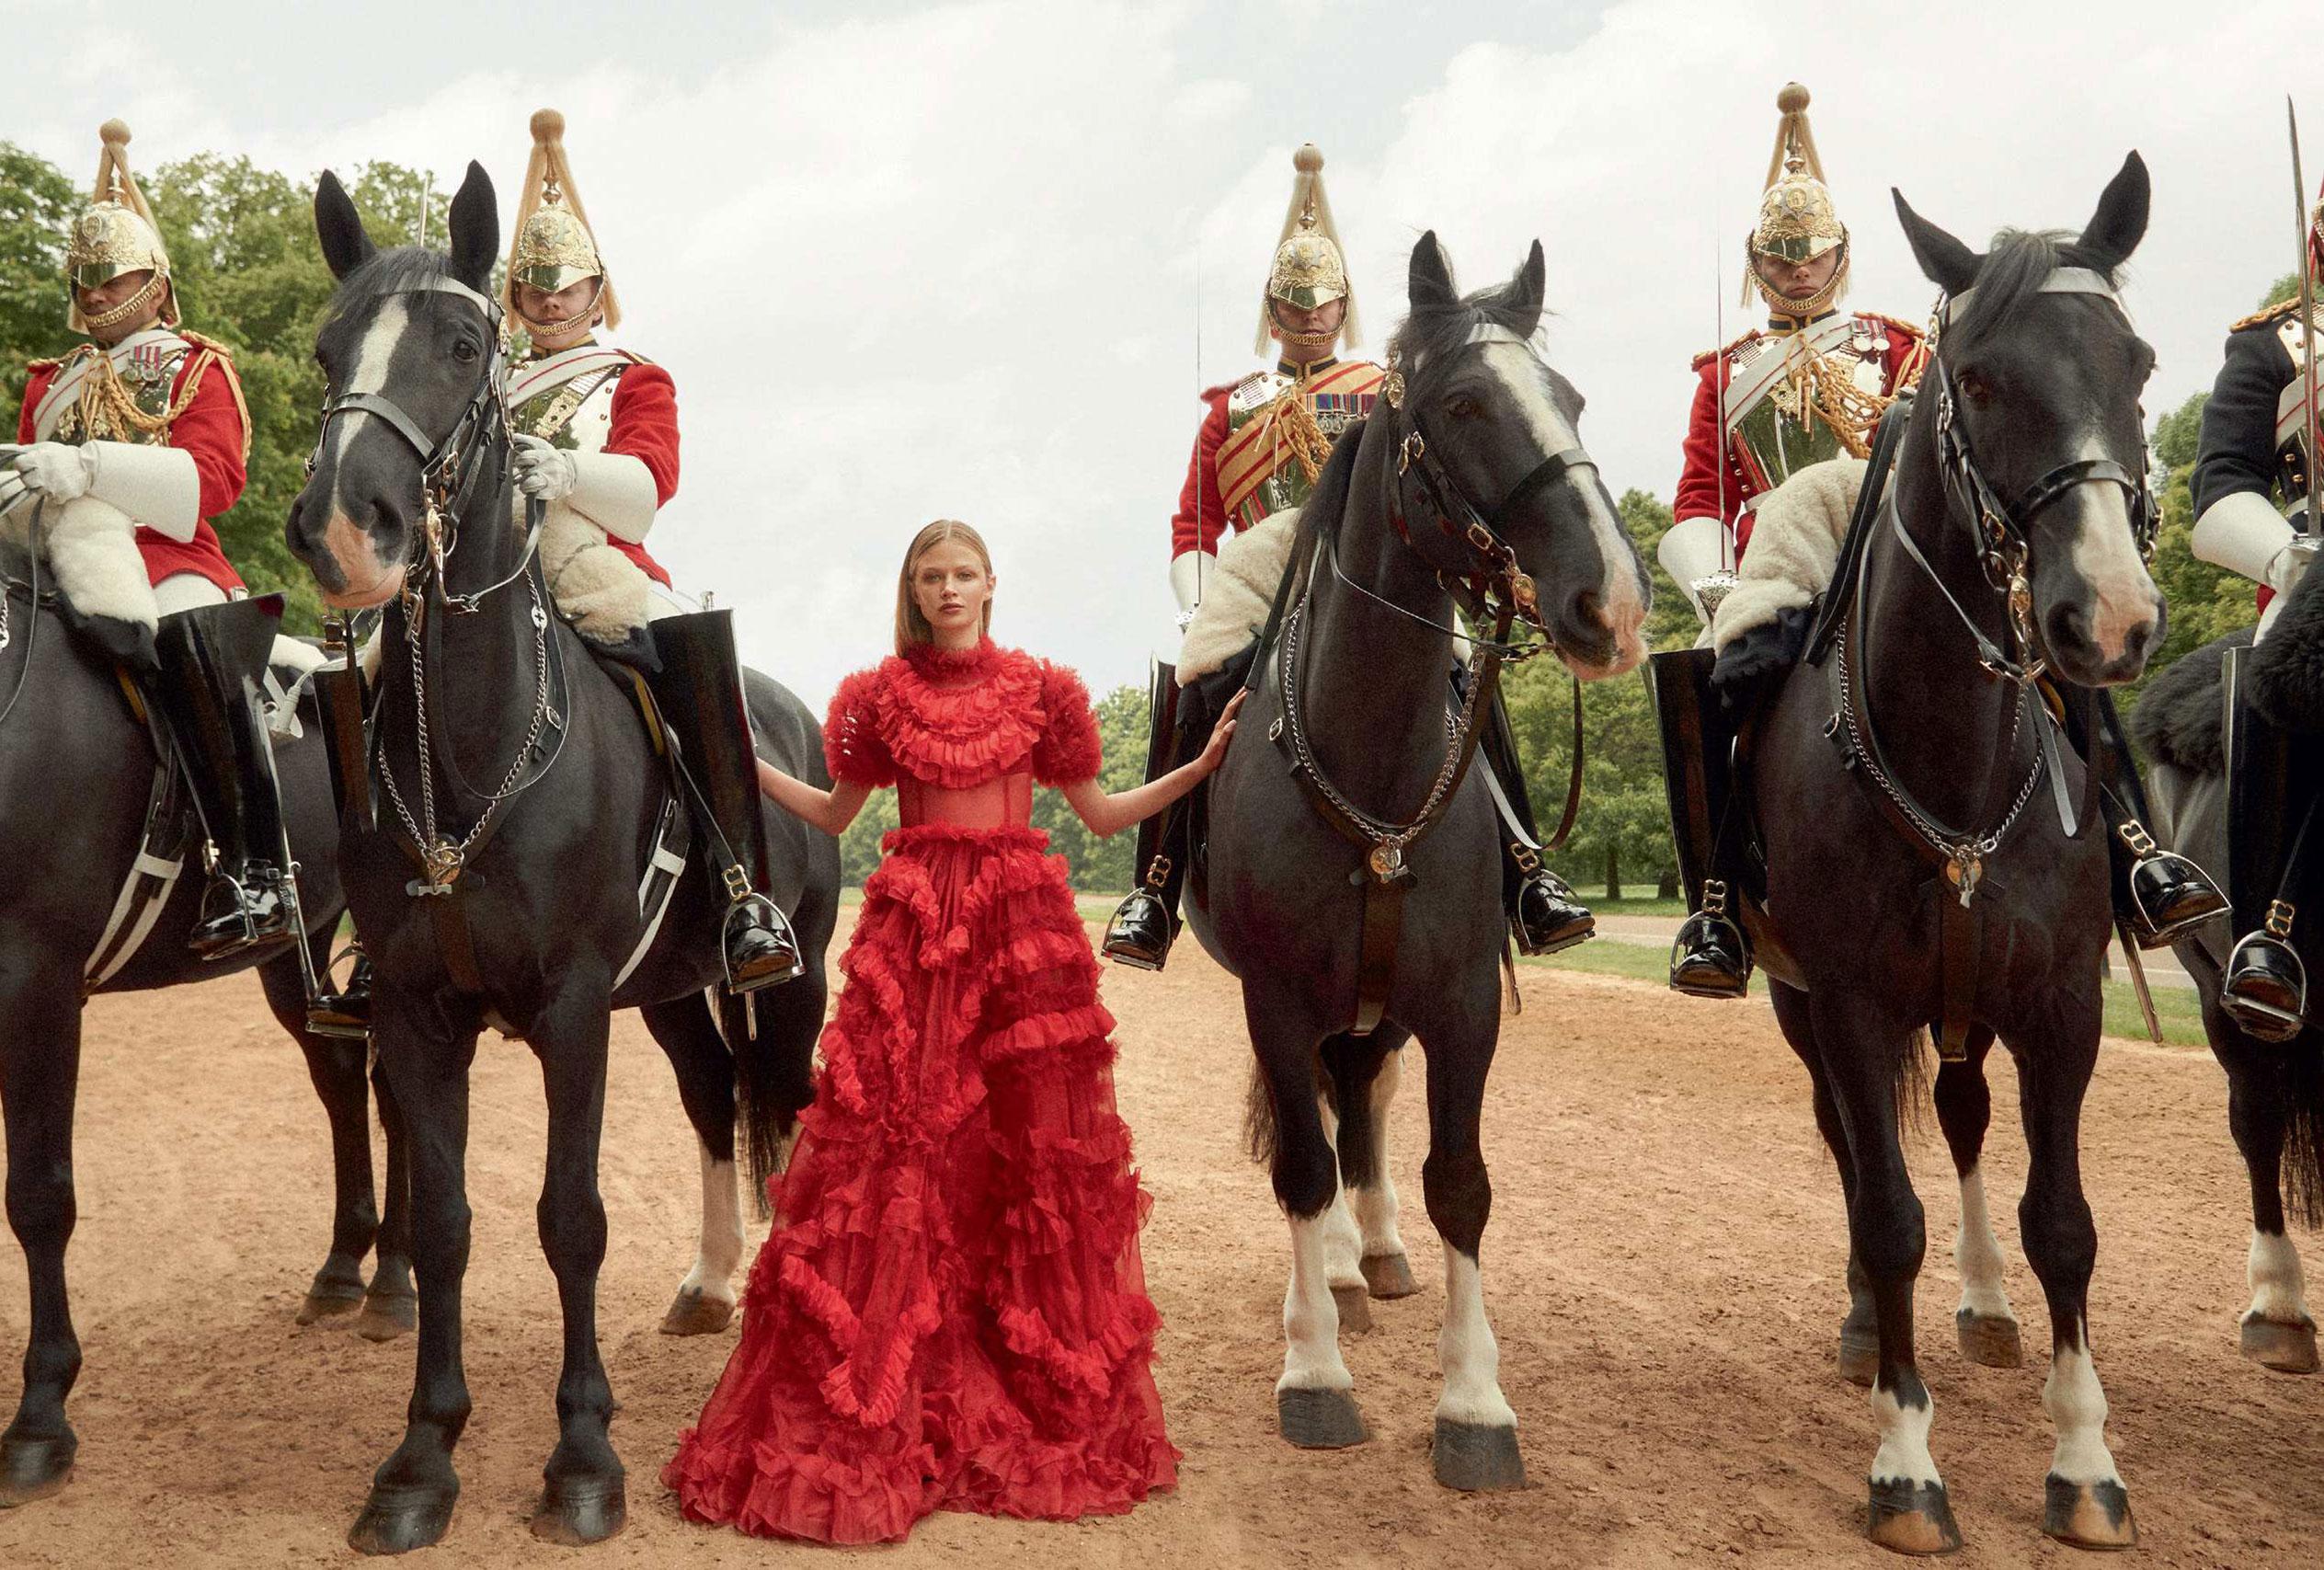 Королевская инспекция караула / For Queen and Country - Anna Lund by Richard Phibbs / Harpers Bazaar UK september 2018